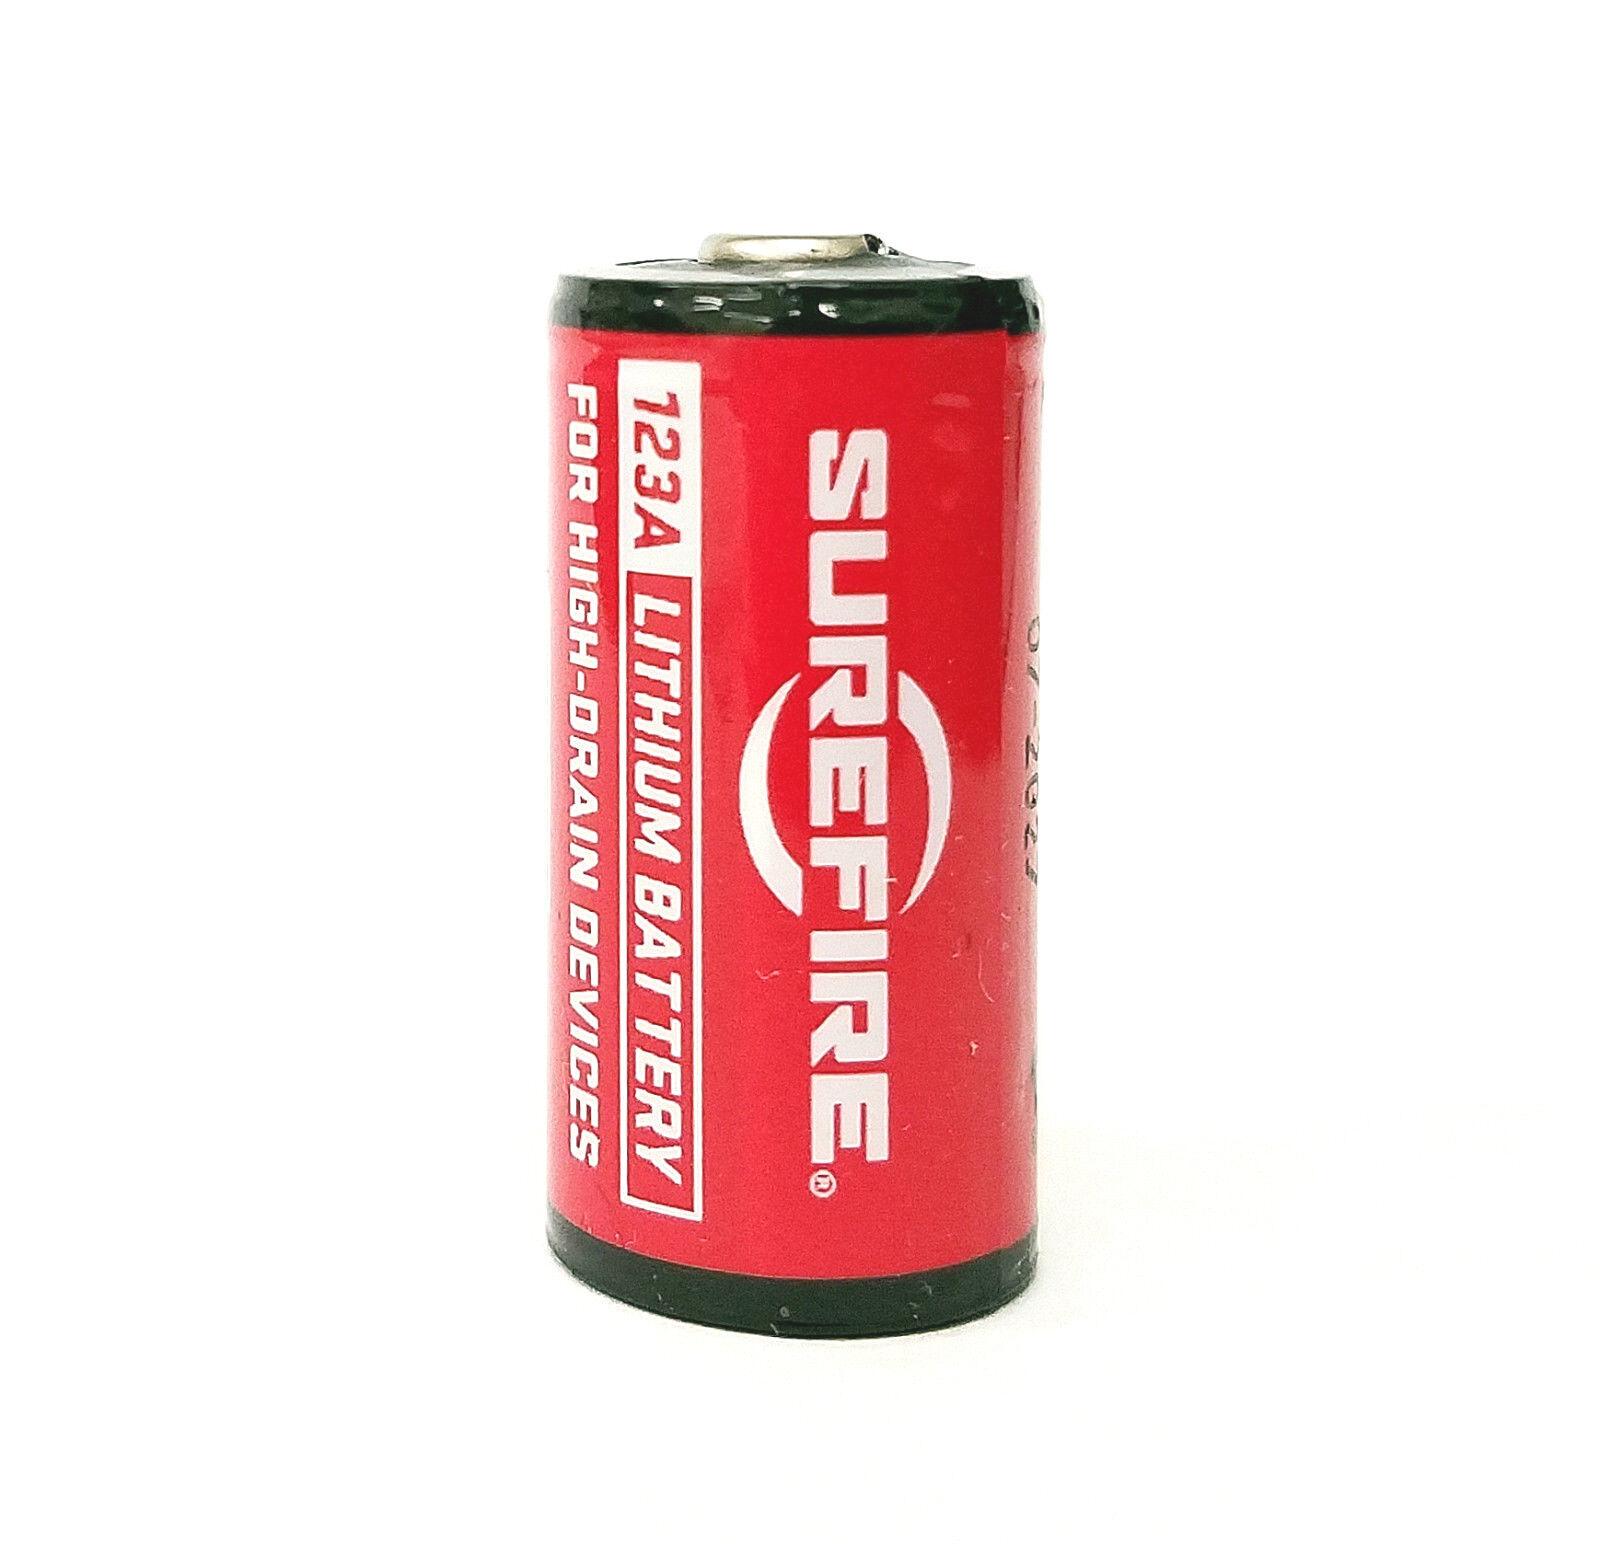 1 SureFire 123A SF123A CR123A Lithium 3V 3 VOLT Batteries